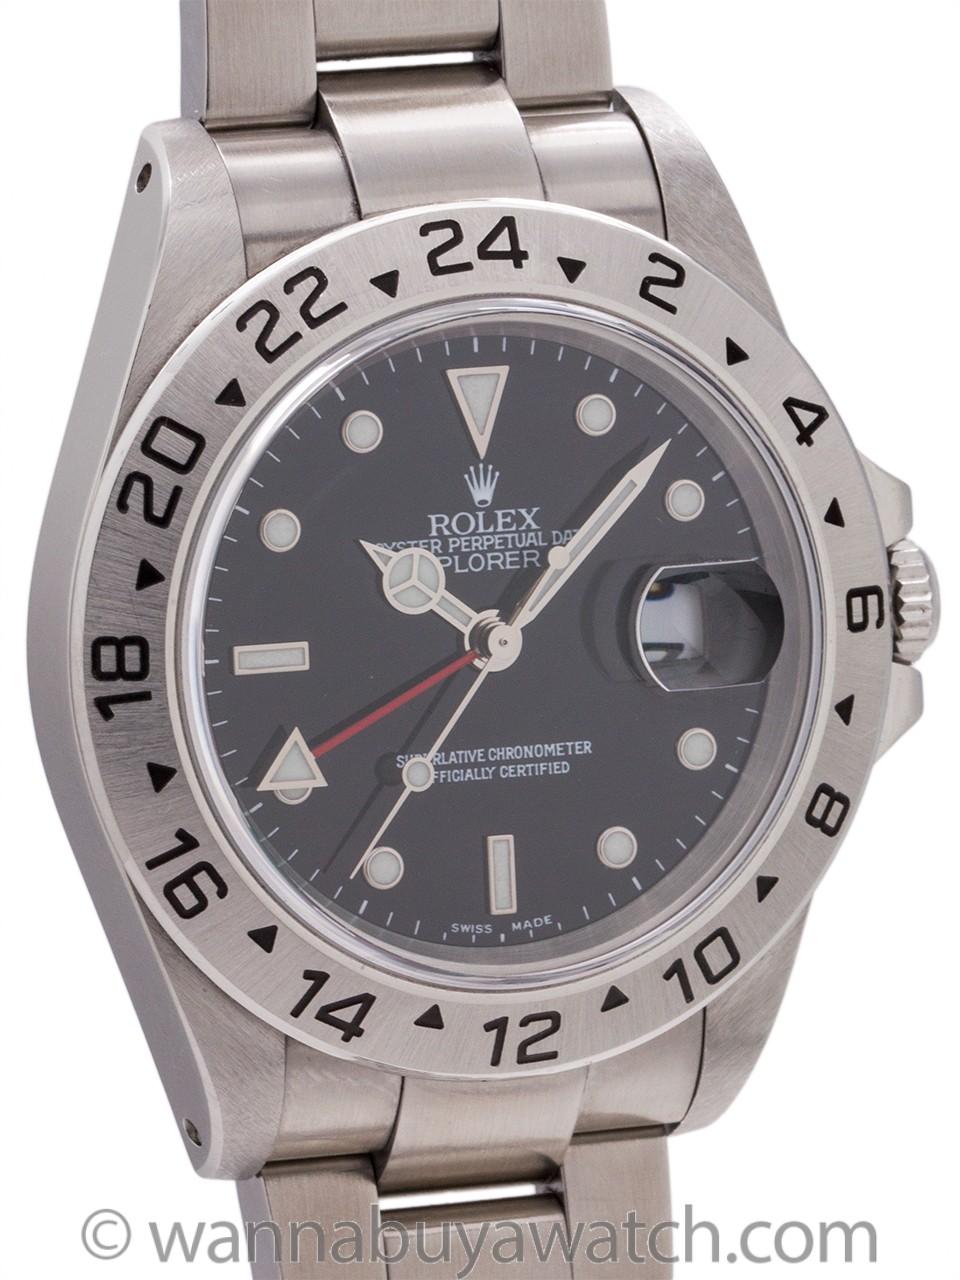 Rolex Explorer II ref 16570 Black Dial circa 2000